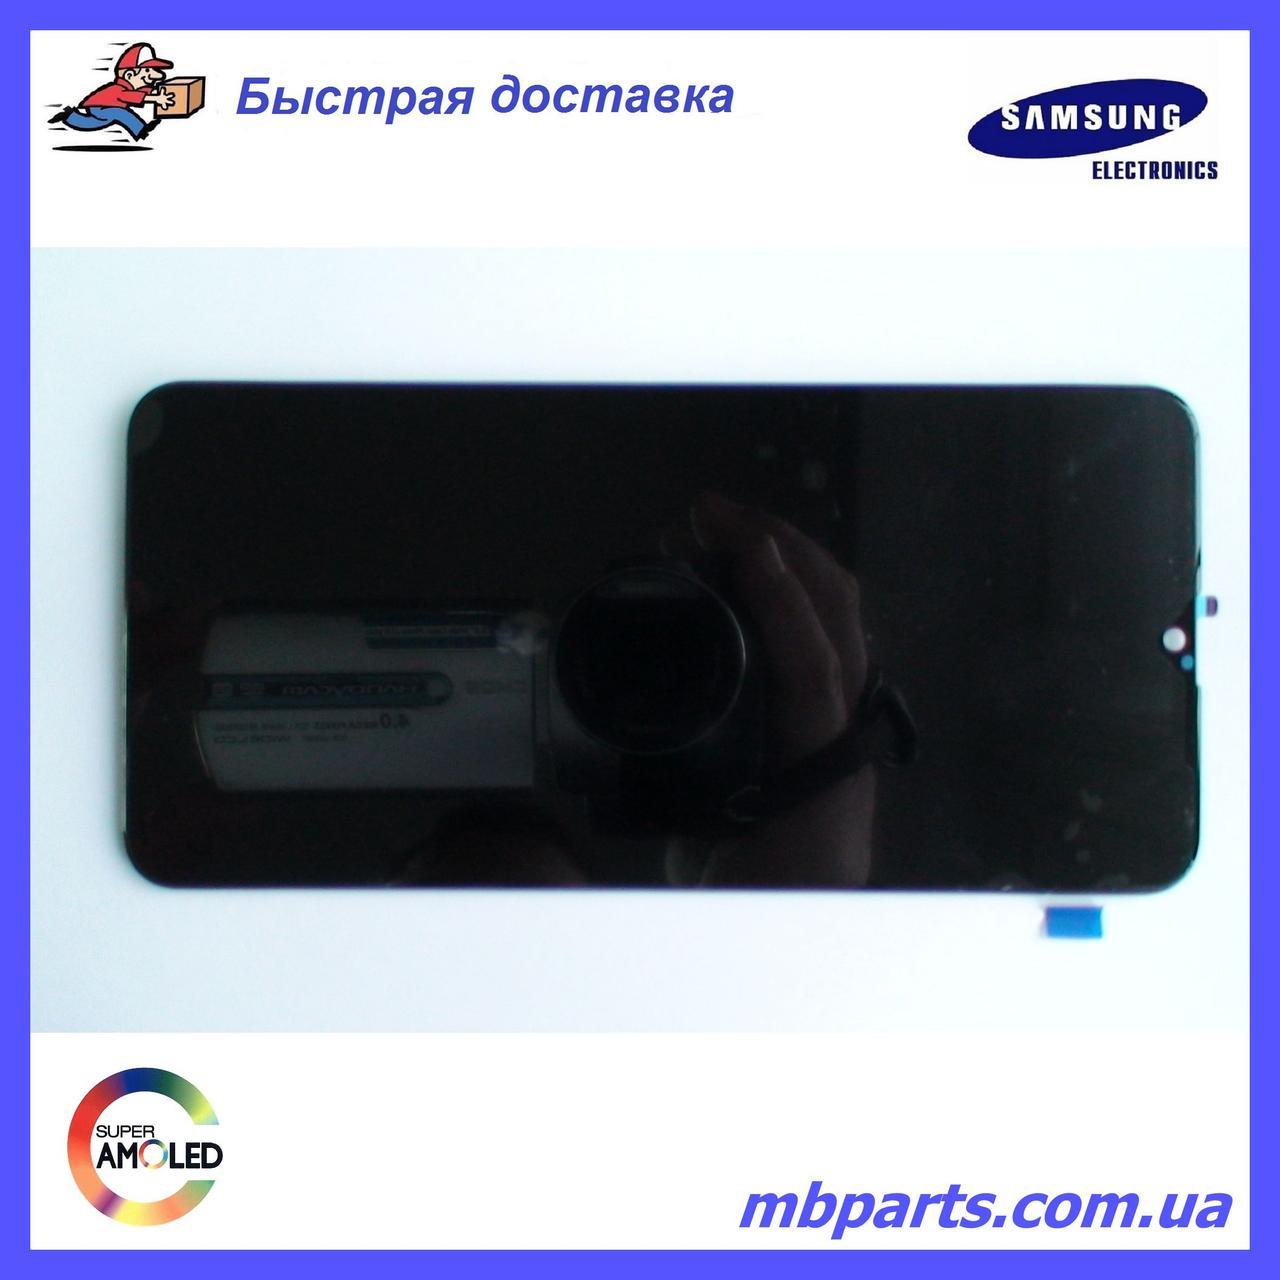 Дисплей с сенсором Samsung А107 Galaxy А10s Black, GH81-17482A, оригинал, без рамки!